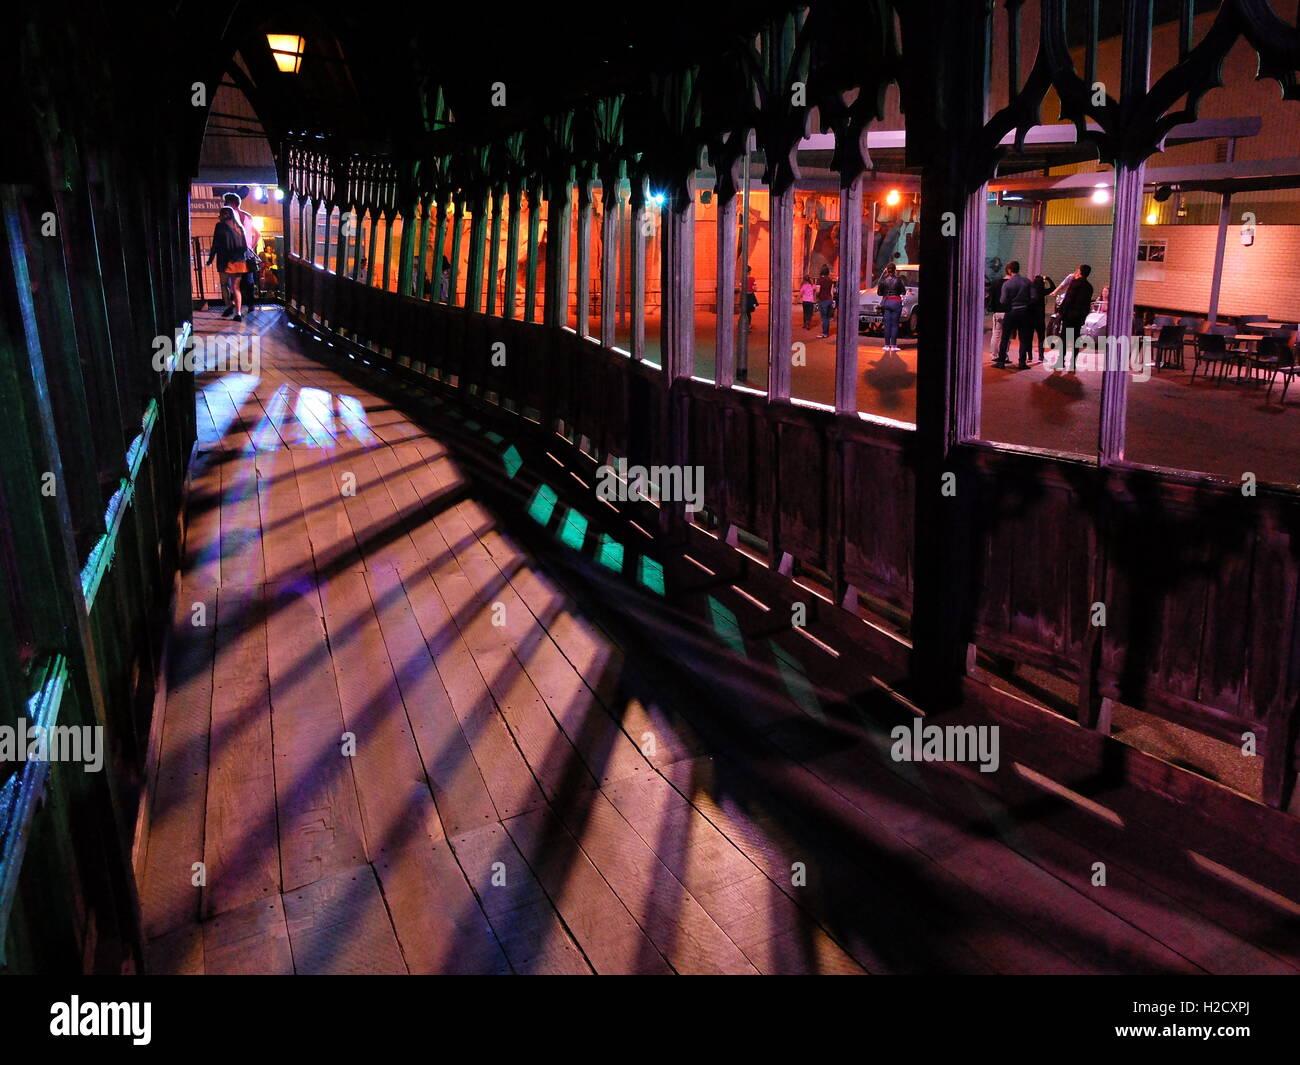 The Making of Harry Potter Warner Bros studio Tour, London. Hogwarts footbridge - Stock Image